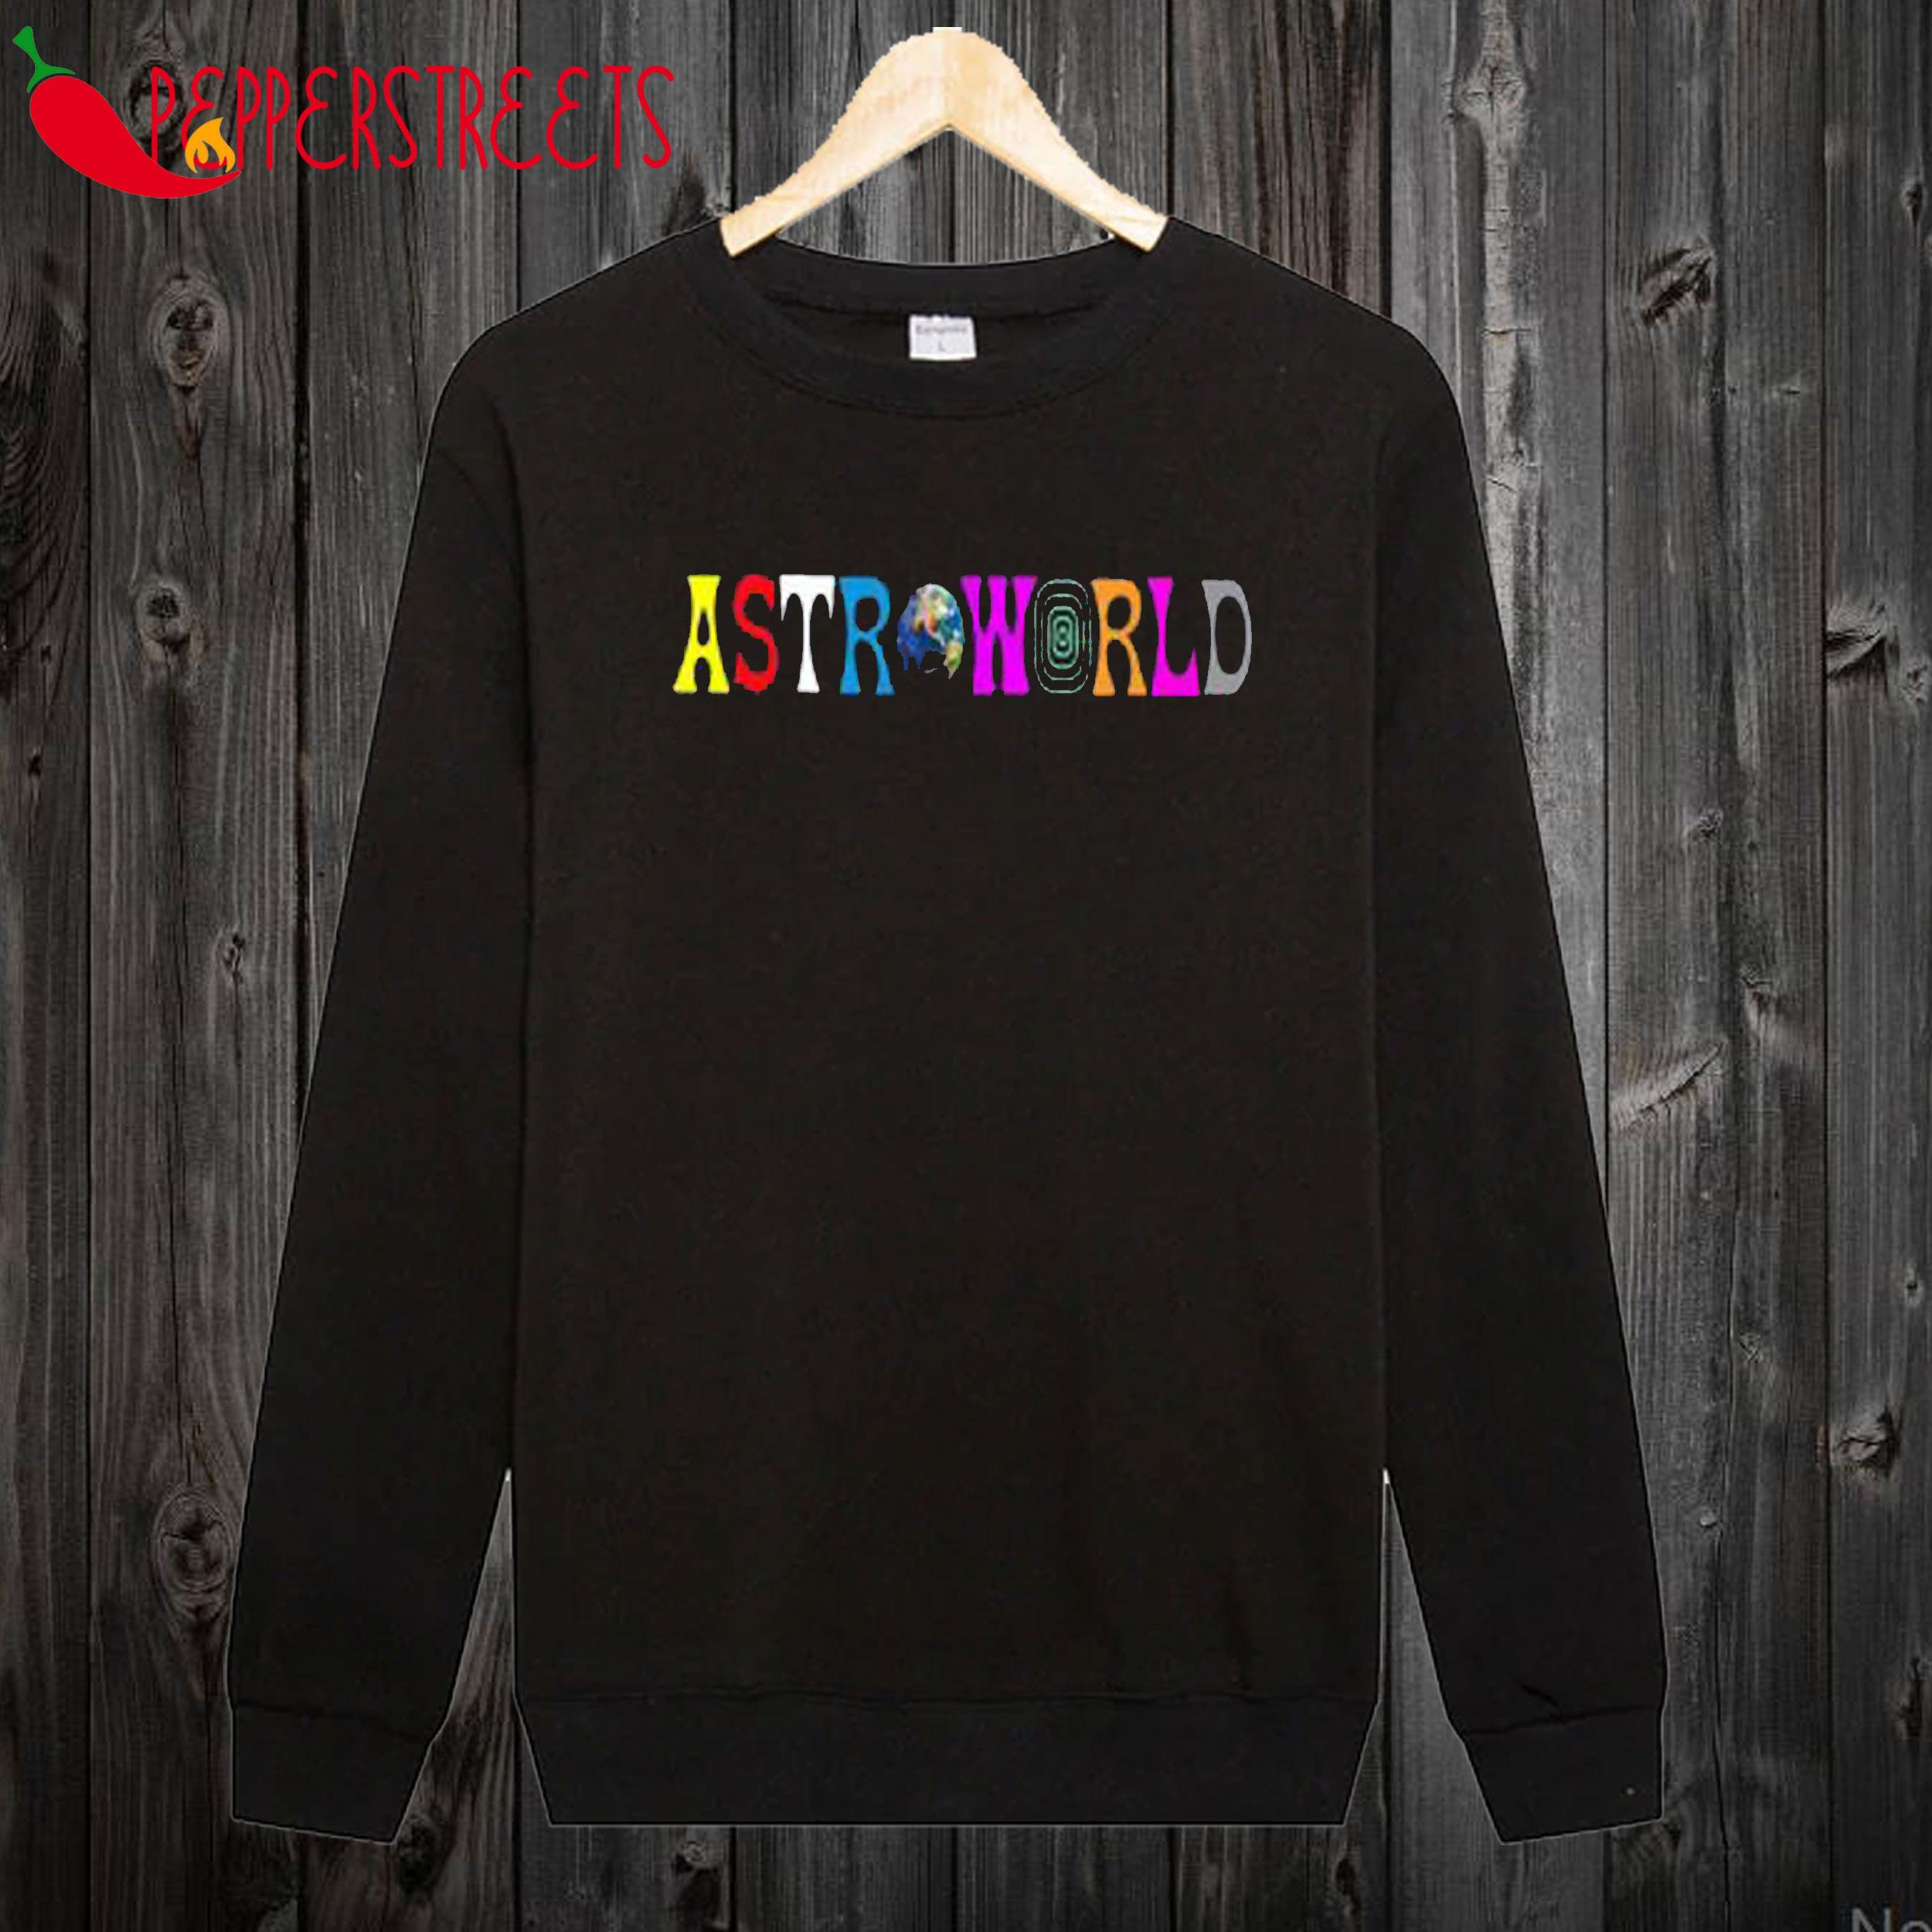 Astroworld Sweatshirt